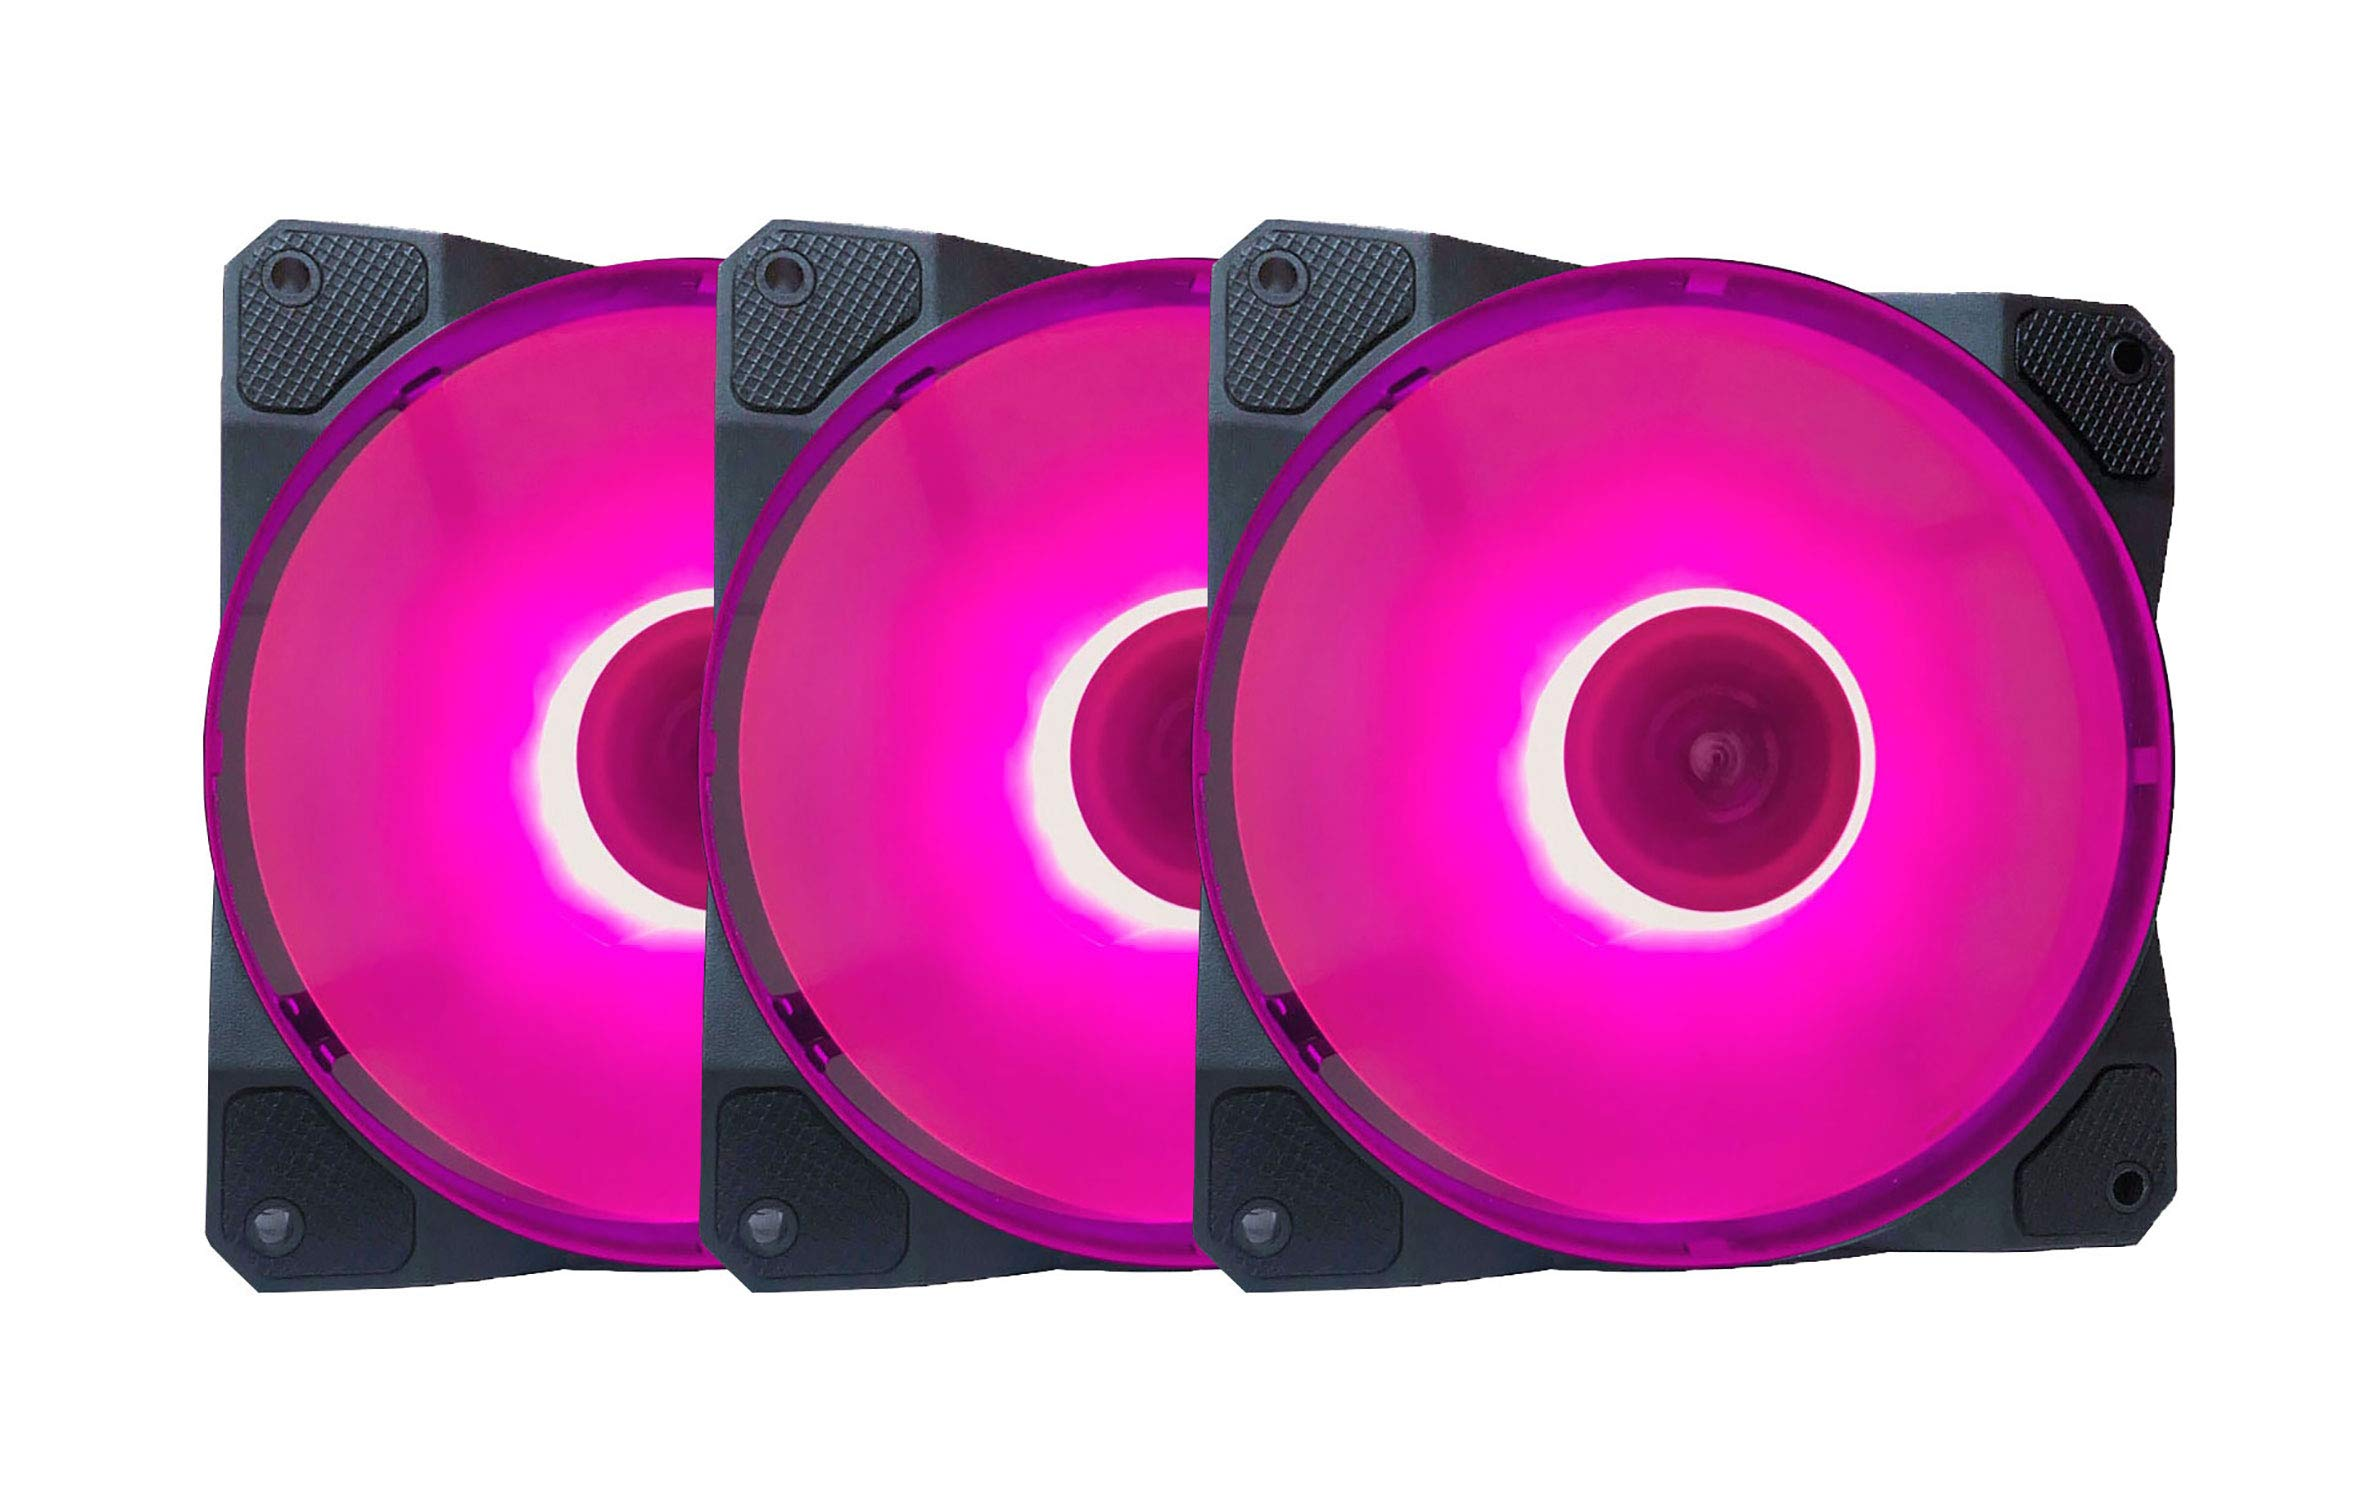 APEVIA CO312L-PK Cosmos 120mm Pink LED Ultra Silent Case Fan w/ 16 LEDs & Anti-Vibration Rubber Pads (3 Pk)